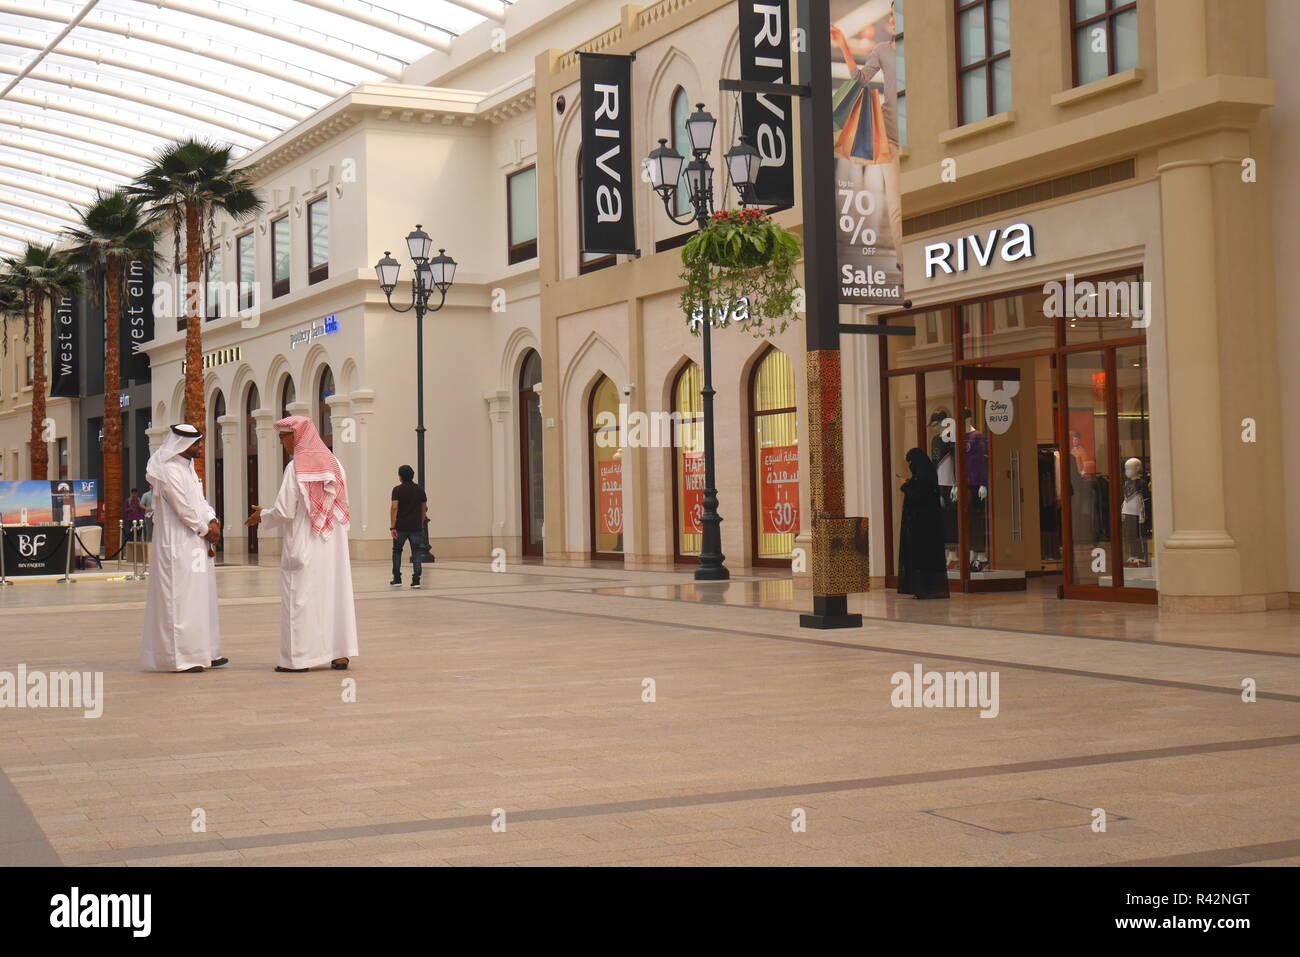 Two Bahraini men in dishdashas talking inside the Avenues shopping mall, located on Bahrain Bay, Manama, Kingdom of Bahrain - Stock Image